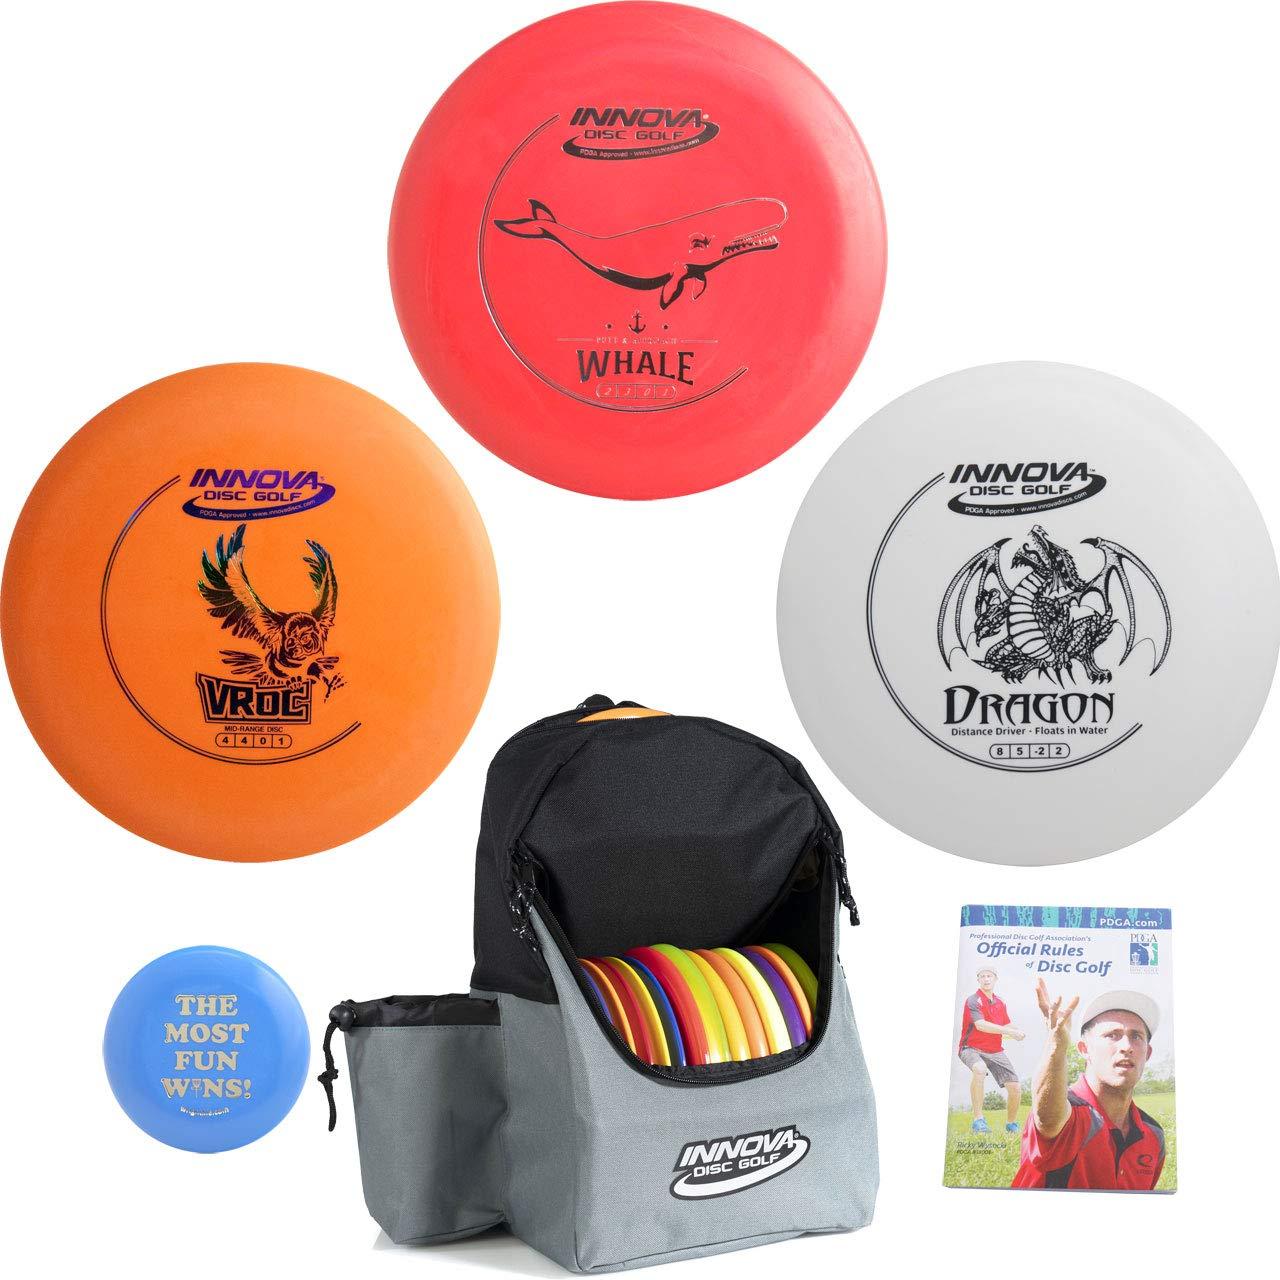 Innova Disc Golf Complete Gift Set Bundle - Discover Backpack Bag, Floating Driver, Mid-Range, Putter + Marker Mini Disc Rules (6 Items) (Gray/Black) by Innova Disc Golf